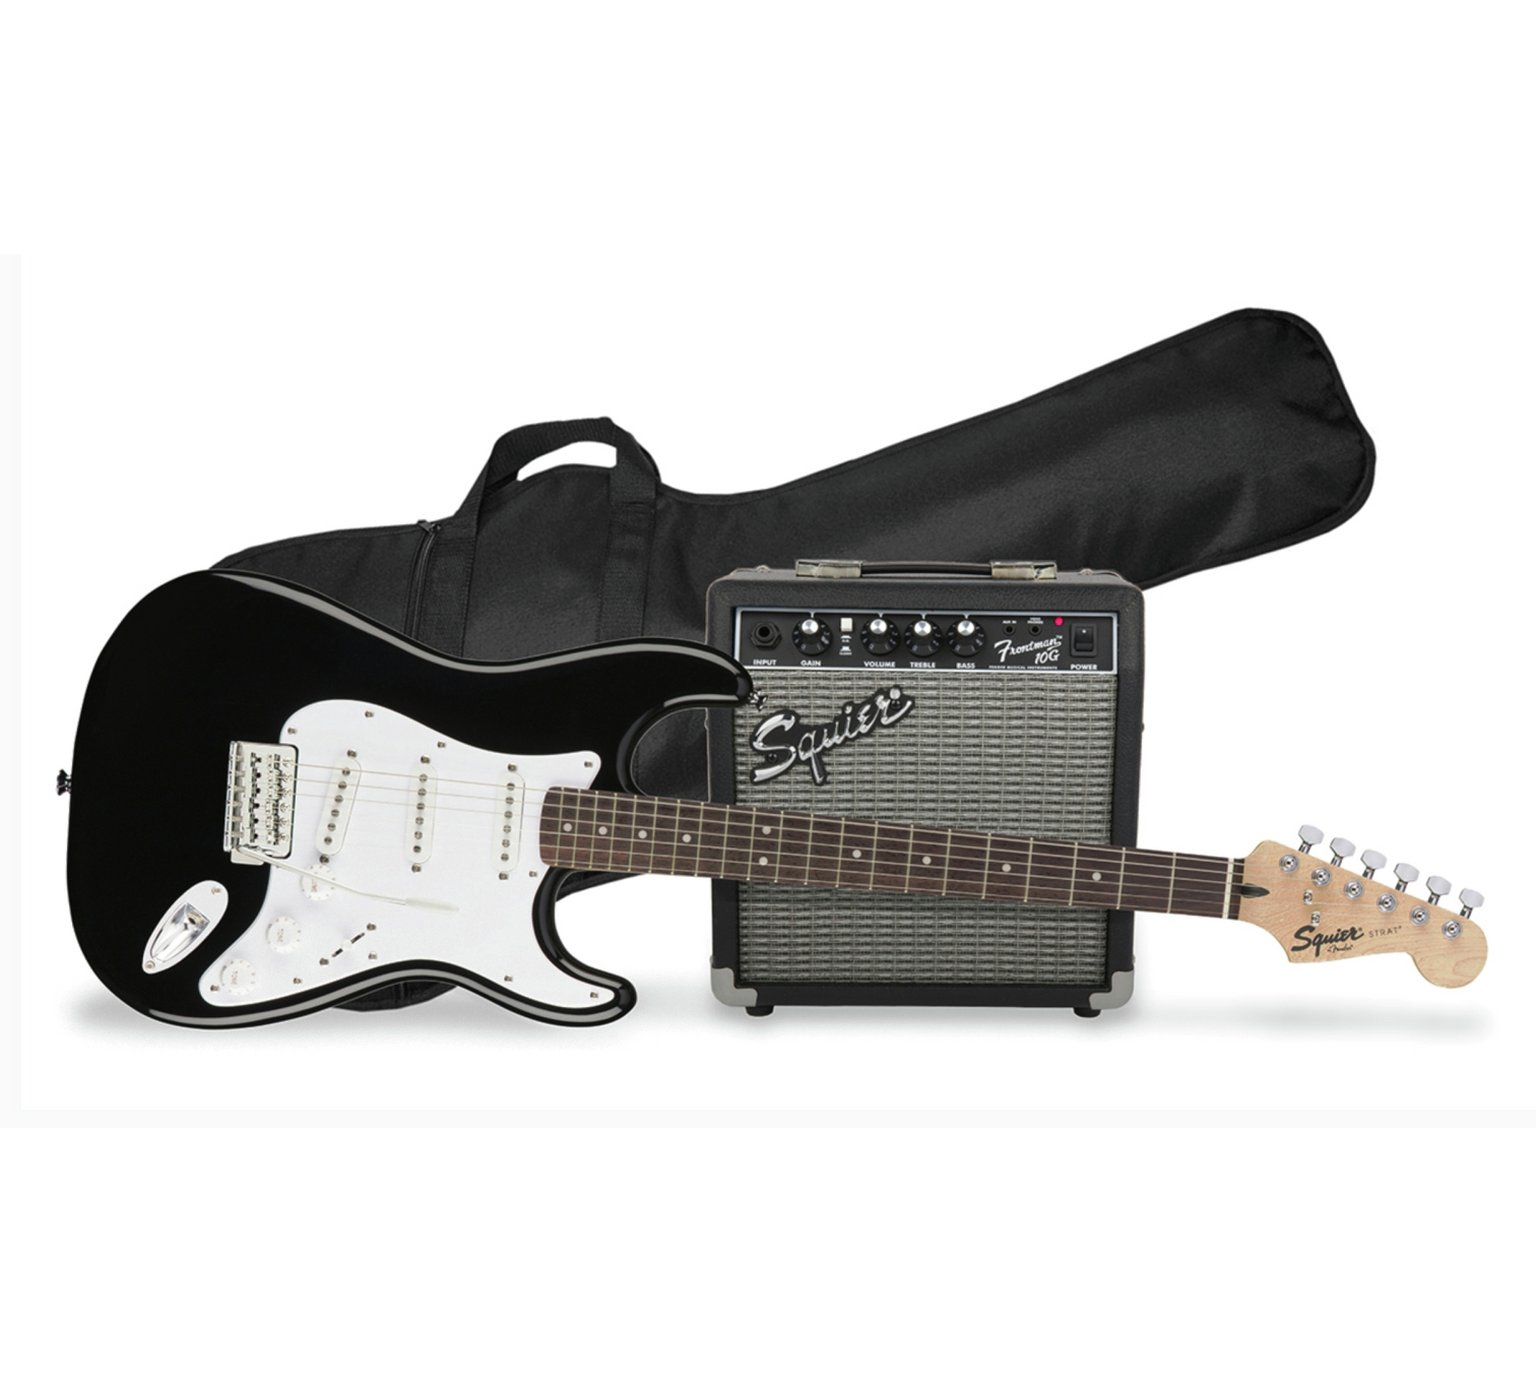 Squier By Fender Electric Guitar Pack - Black